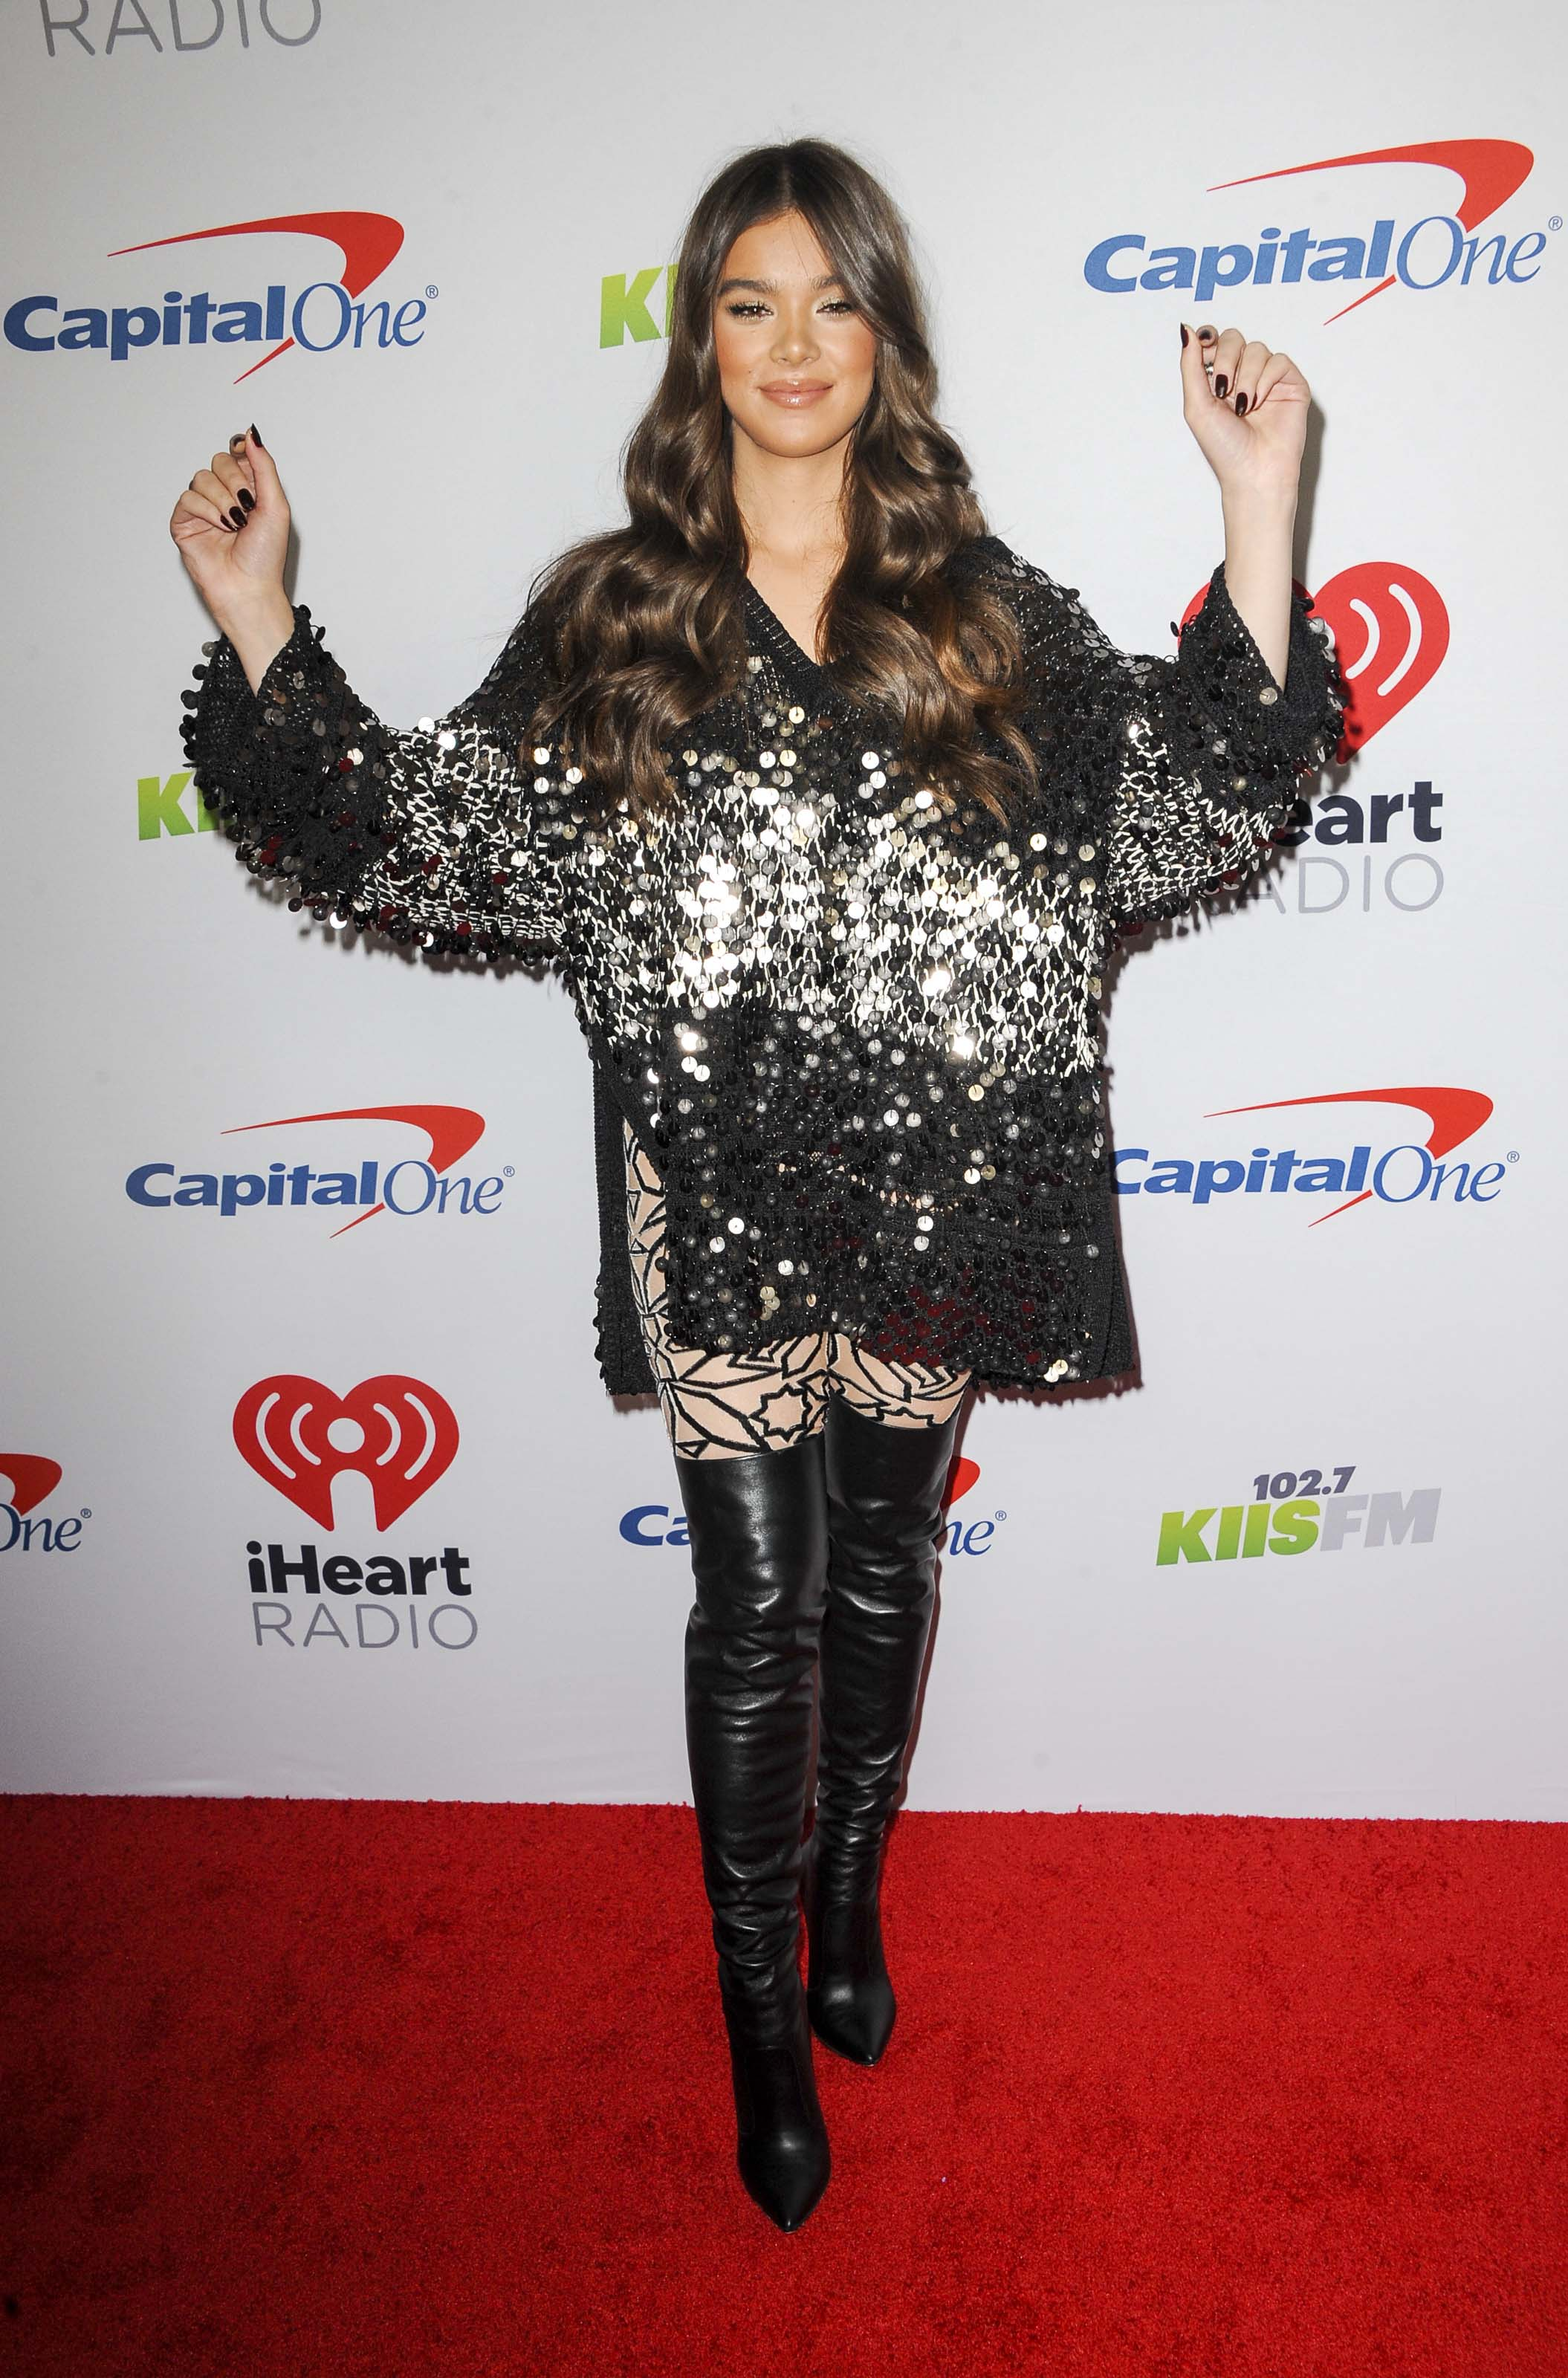 Hailee Steinfeld attends The KIIS FM Jingle Ball